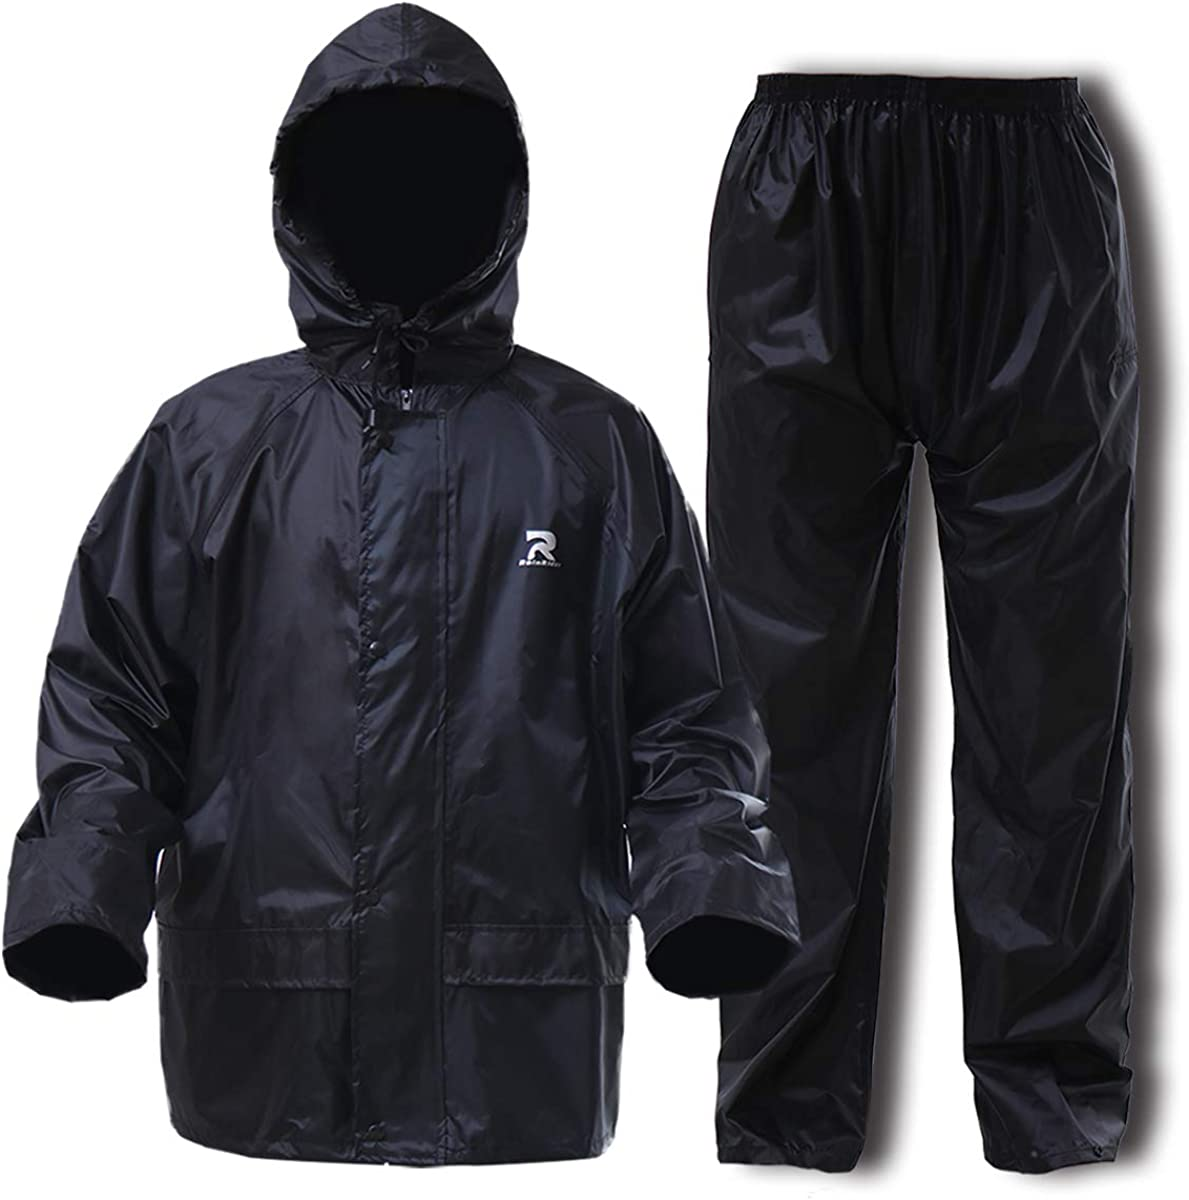 RainRider Rain High quality Suits for Men Lightweight Fort Worth Mall Waterproof Women G